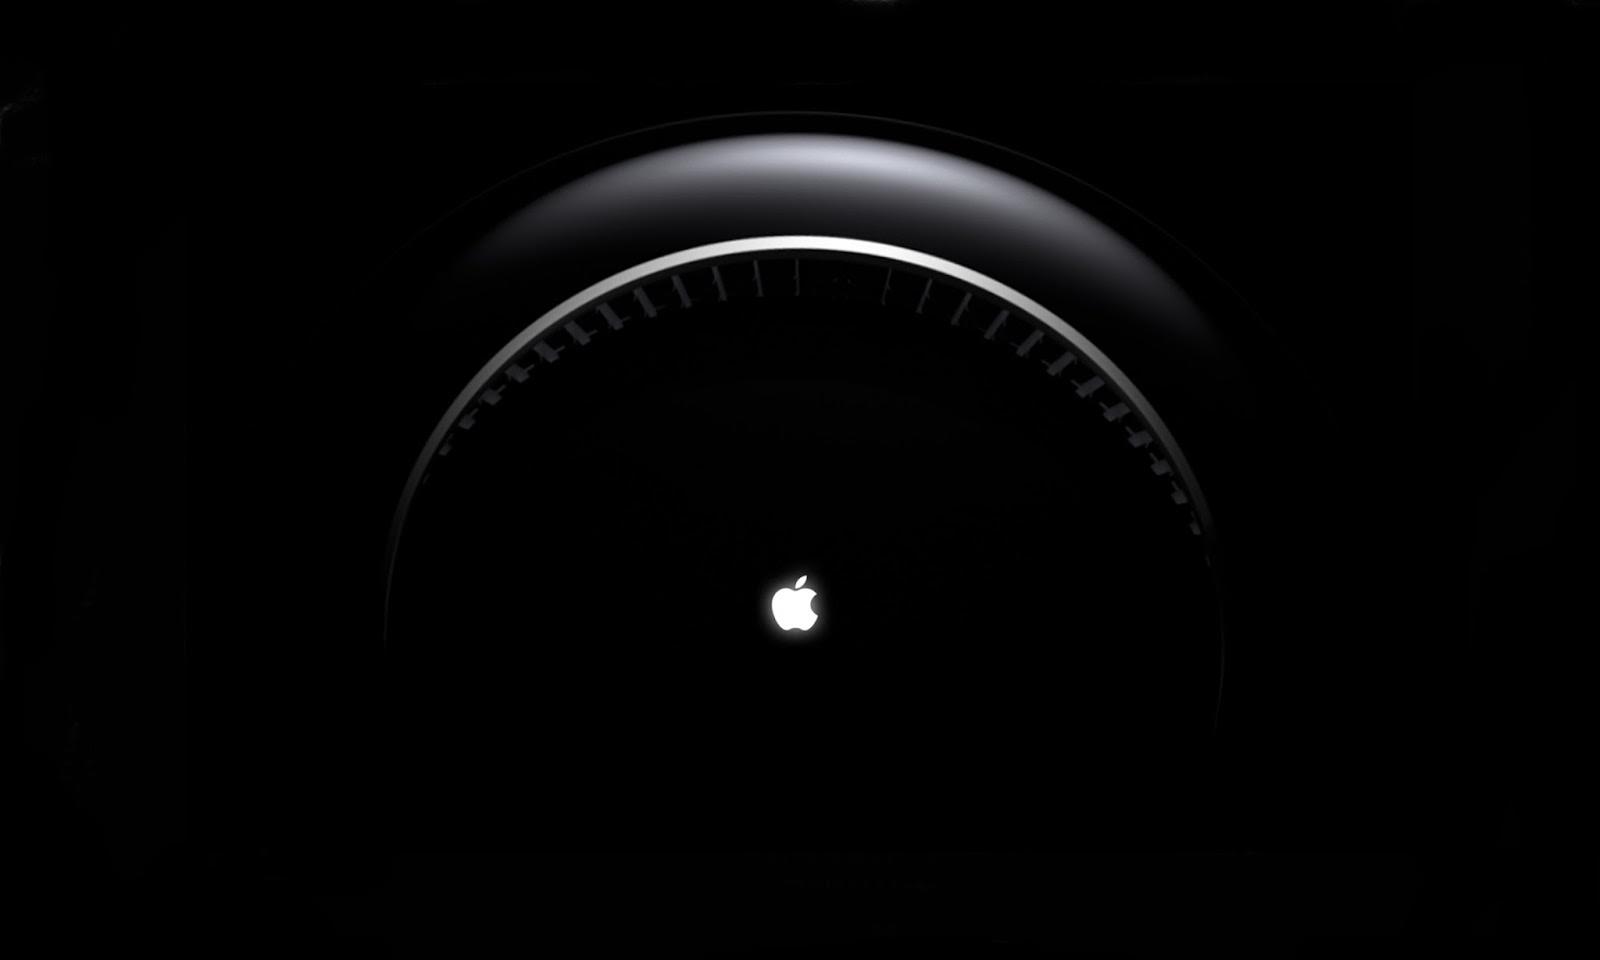 mac pro hd wallpapers download apple mac pro hd wallpapers 1080p 1600x960